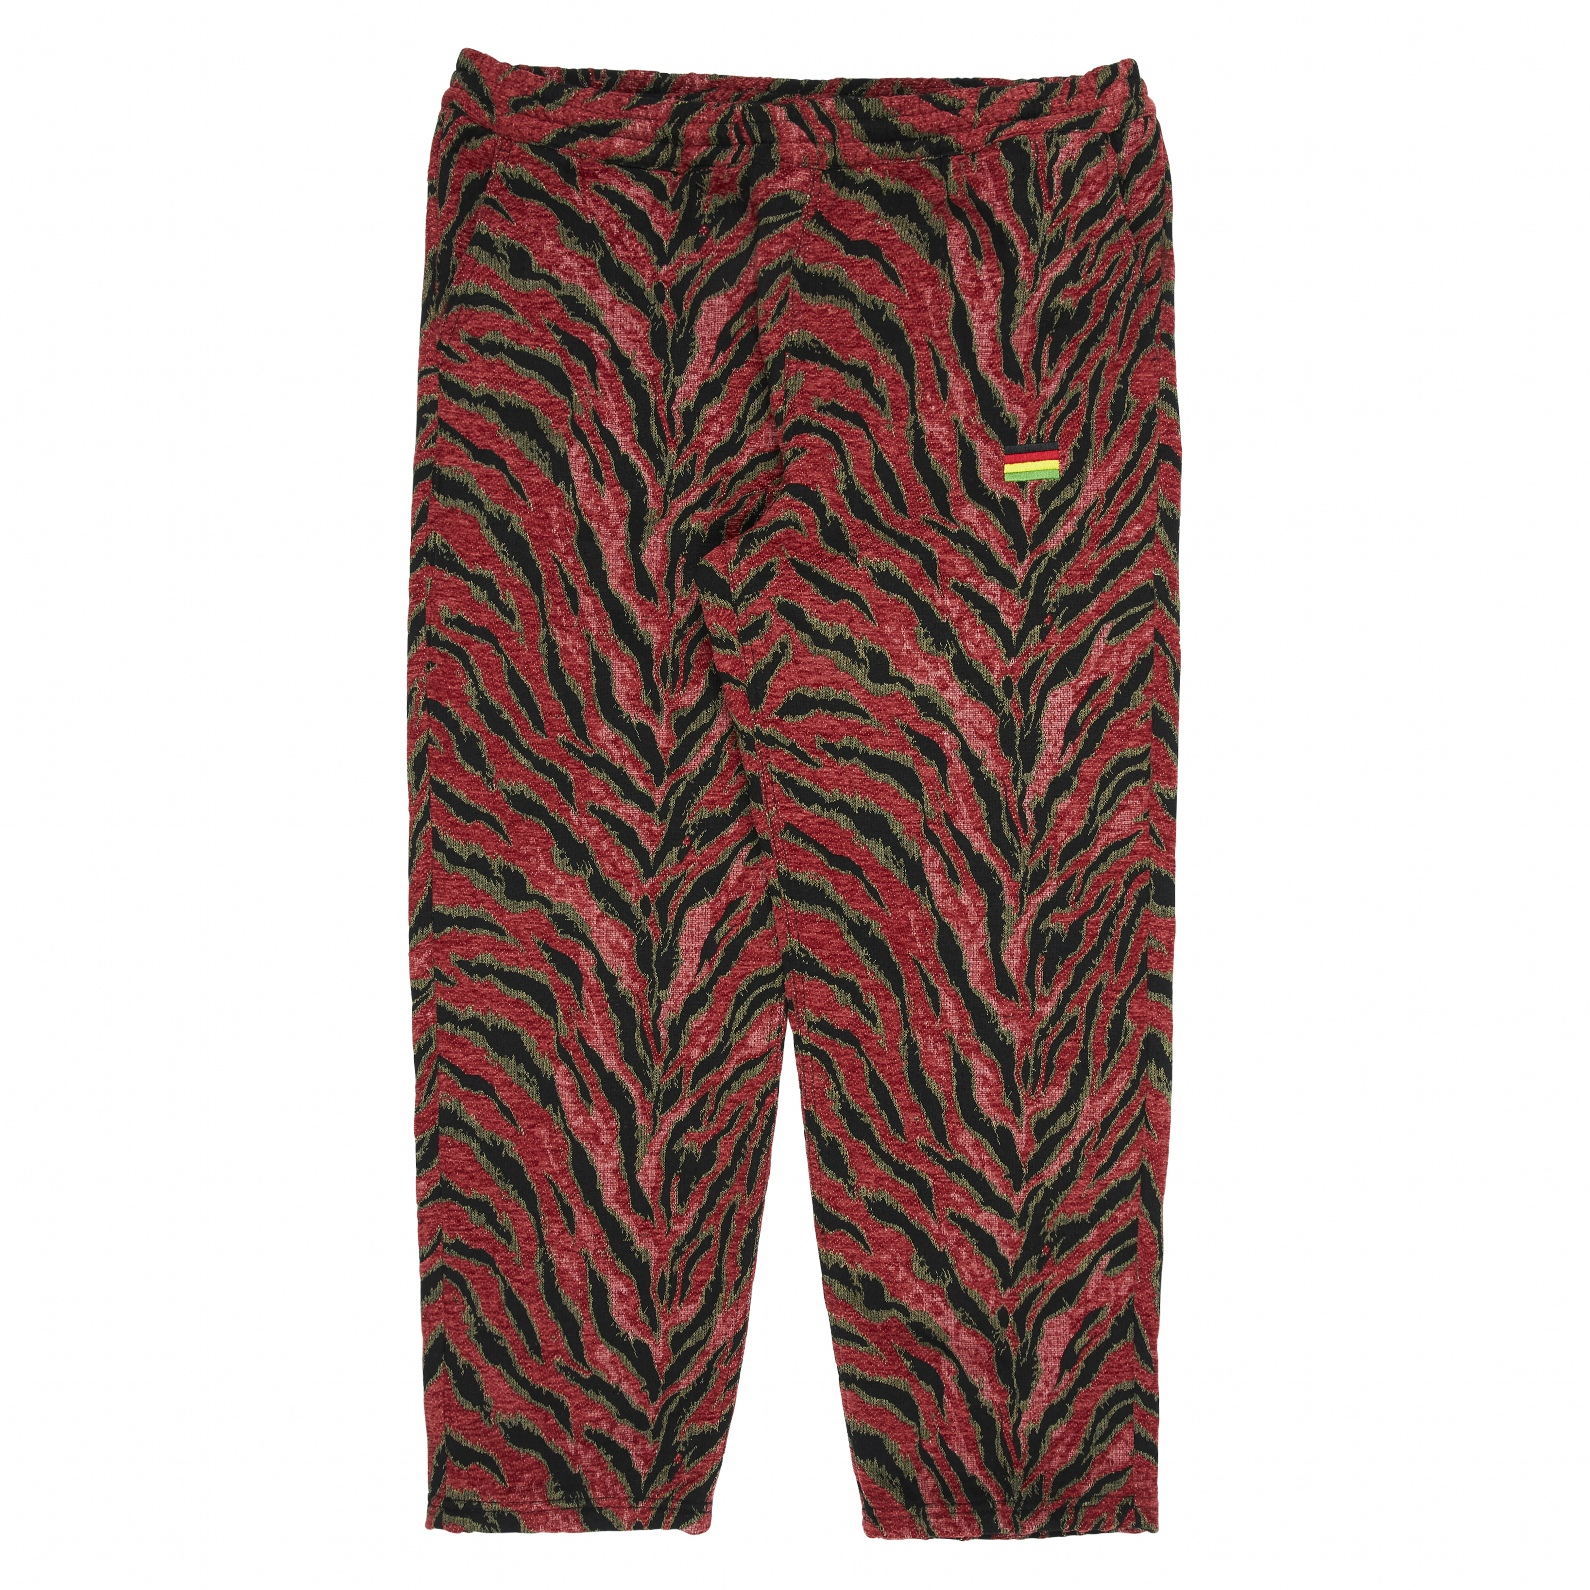 【PLEASURES/プレジャーズ】JUNGLE PANT パンツ / RED